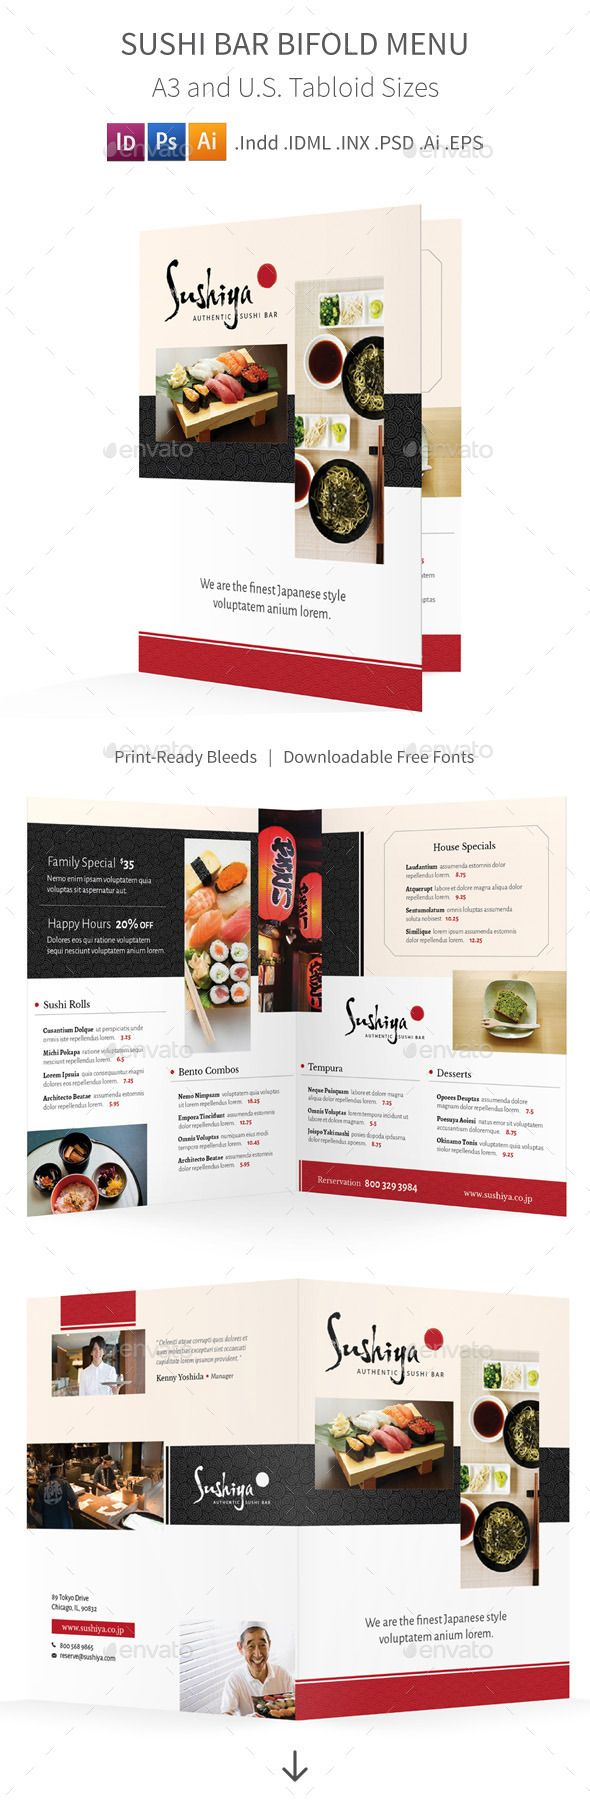 Sushi Bar Bifold / Halffold Menu - Food Menus Print Templates Download here : https://graphicriver.net/item/sushi-bar-bifold-halffold-menu/10353298?s_rank=916&ref=Al-fatih